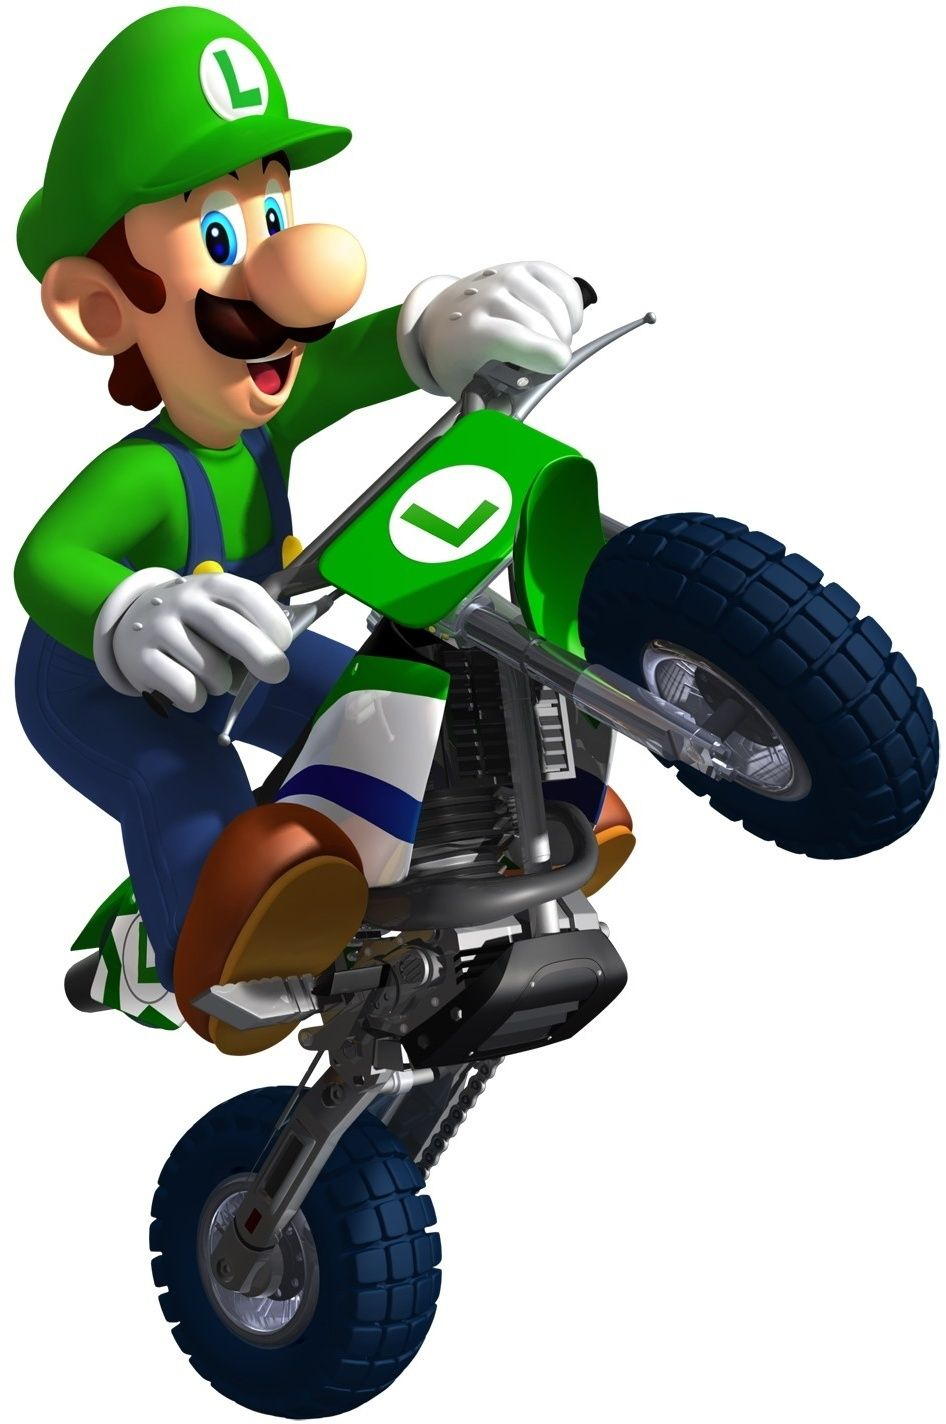 Mario And Luigi Photo Mario Kart Wii Mario Kart Characters Mario And Luigi Wii Party